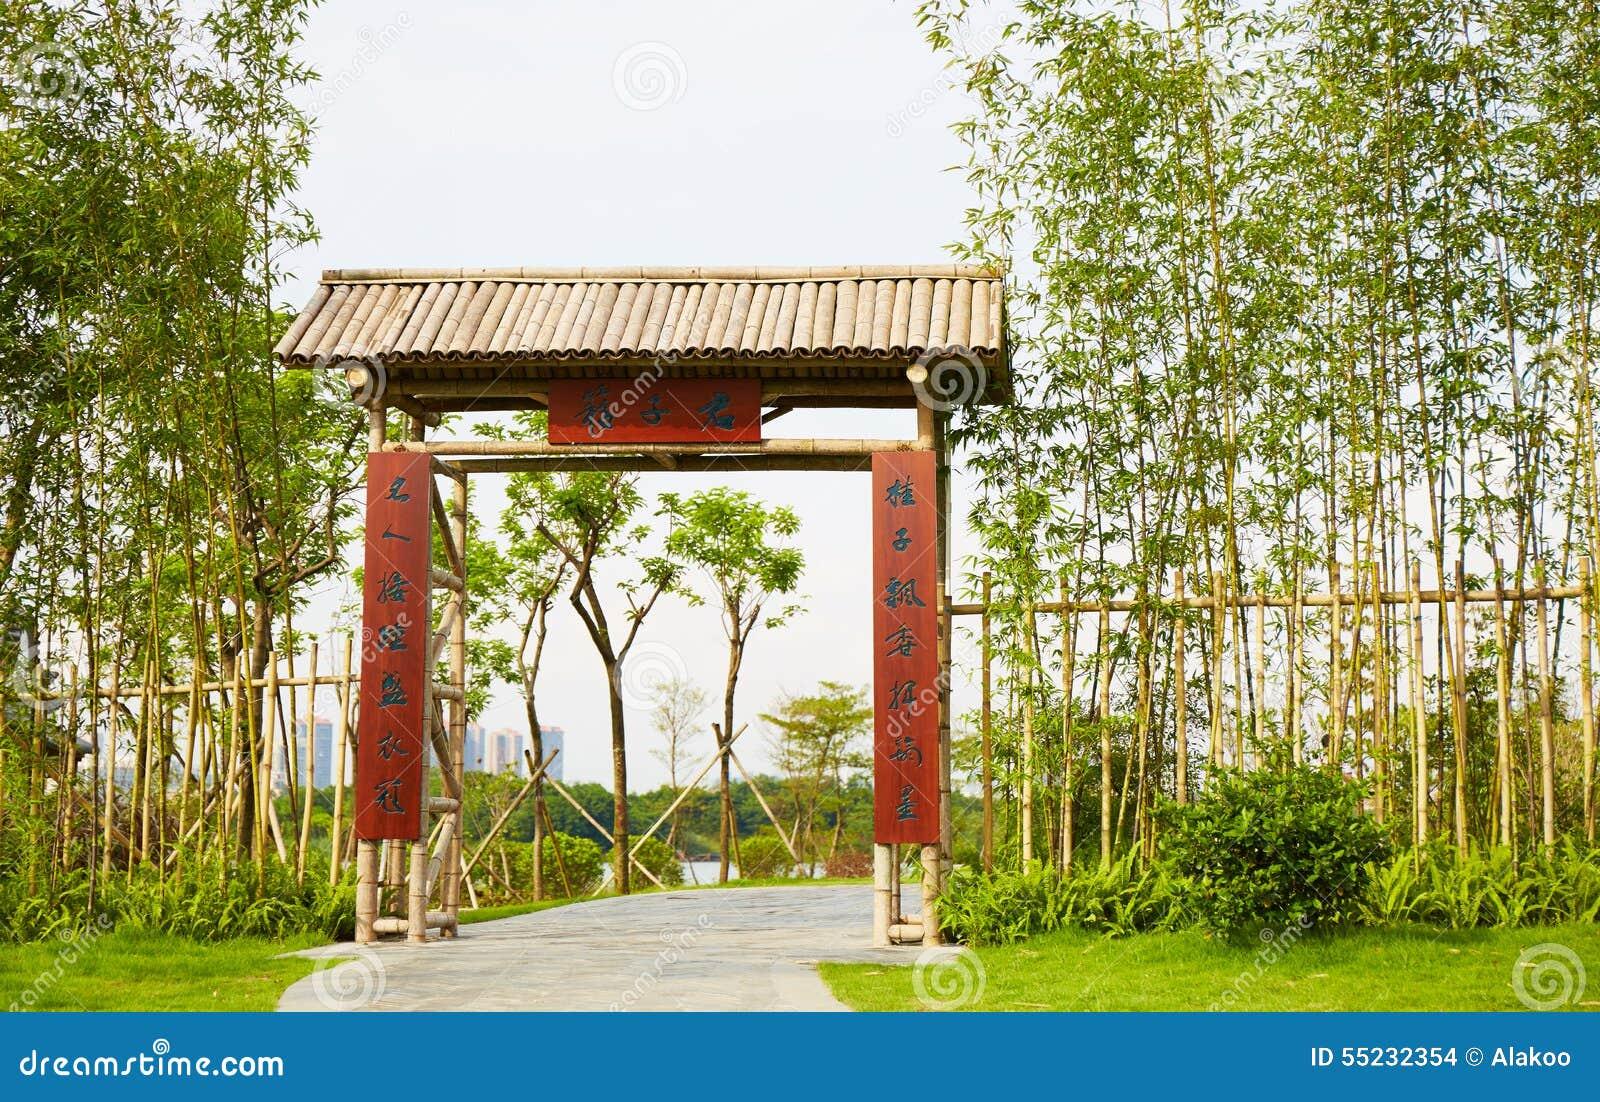 Porte en bambou chinoise